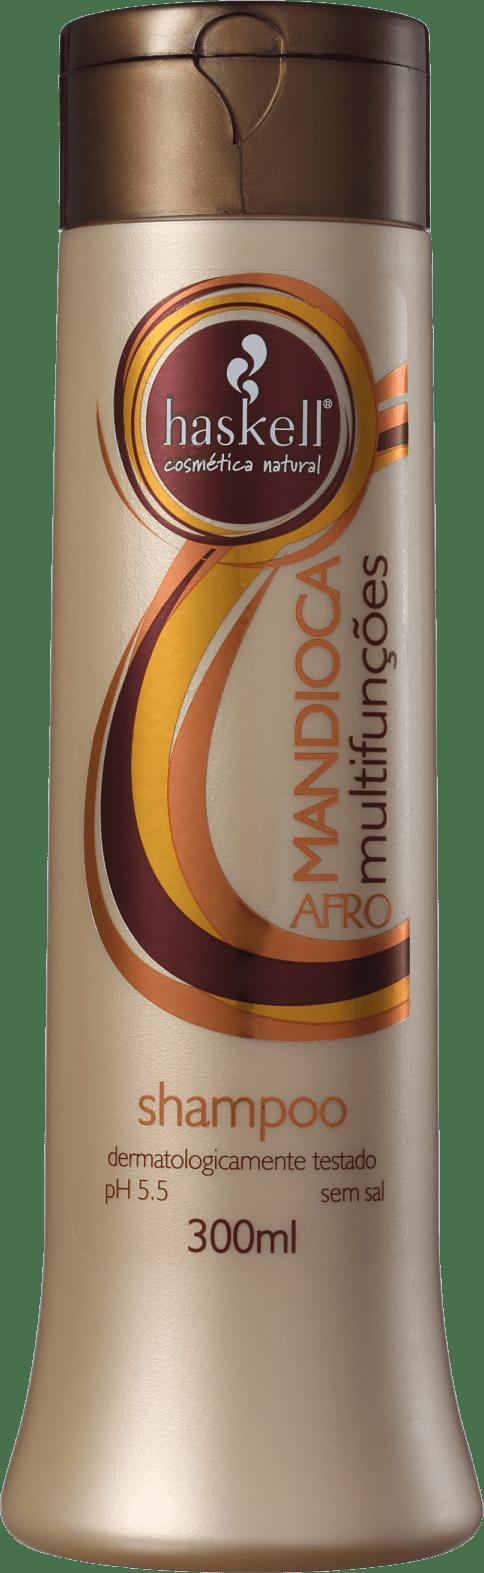 f13d59b5d Haskell Mandioca Multifunções Afro - Shampoo 300ml